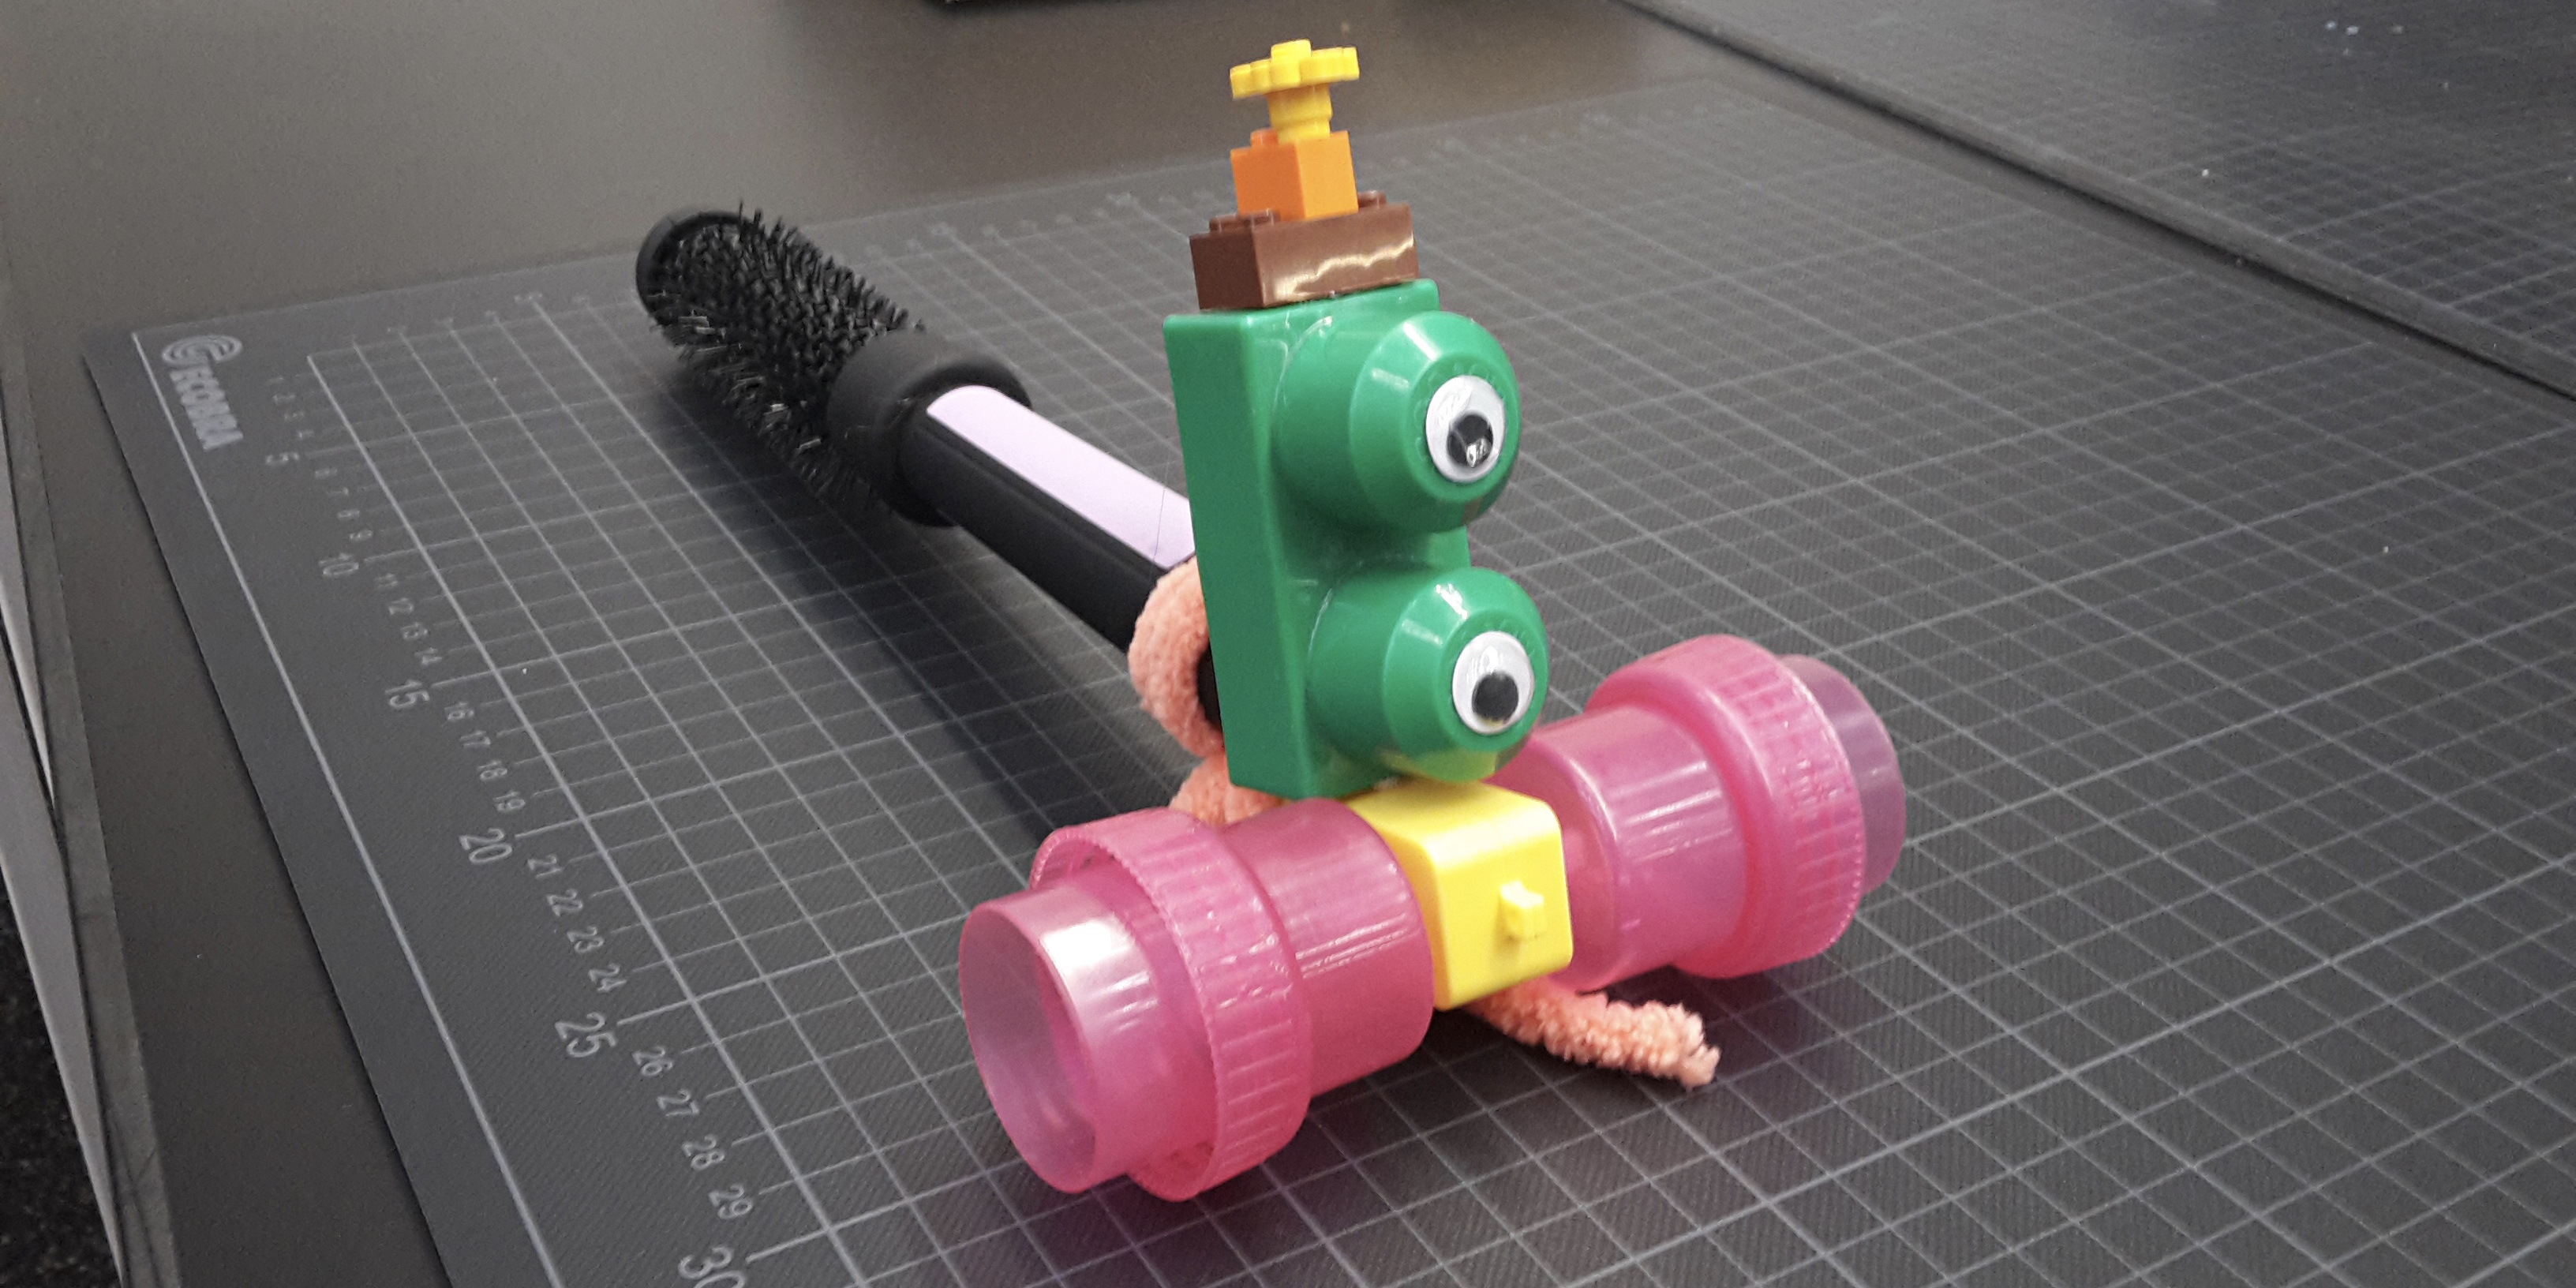 Ort für Visionäre - Das Futurium Roboter Lab am 16. September   Otto ...